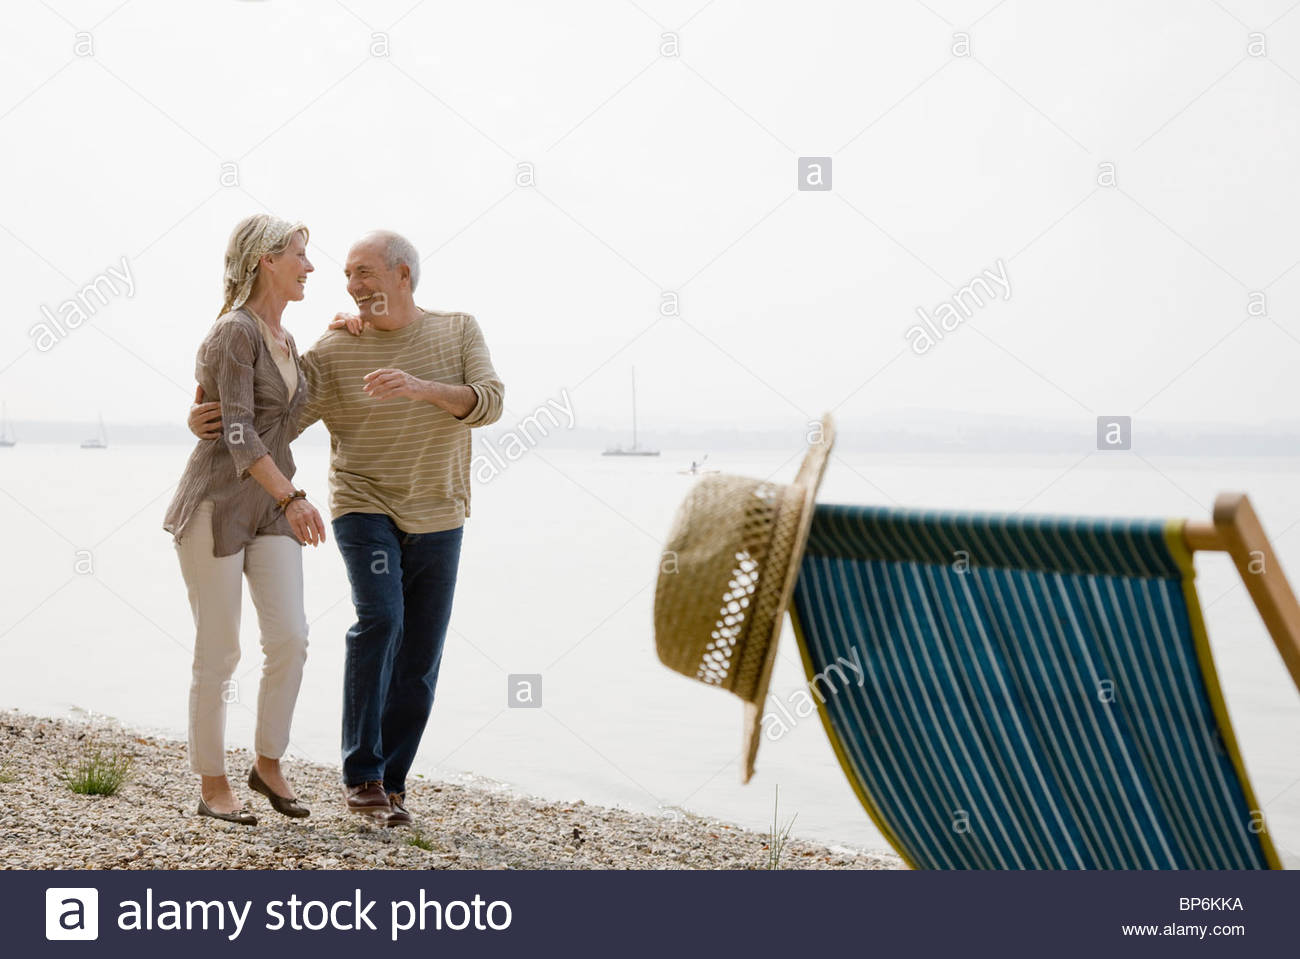 A senior couple walking beside a lake laughing - Stock Image